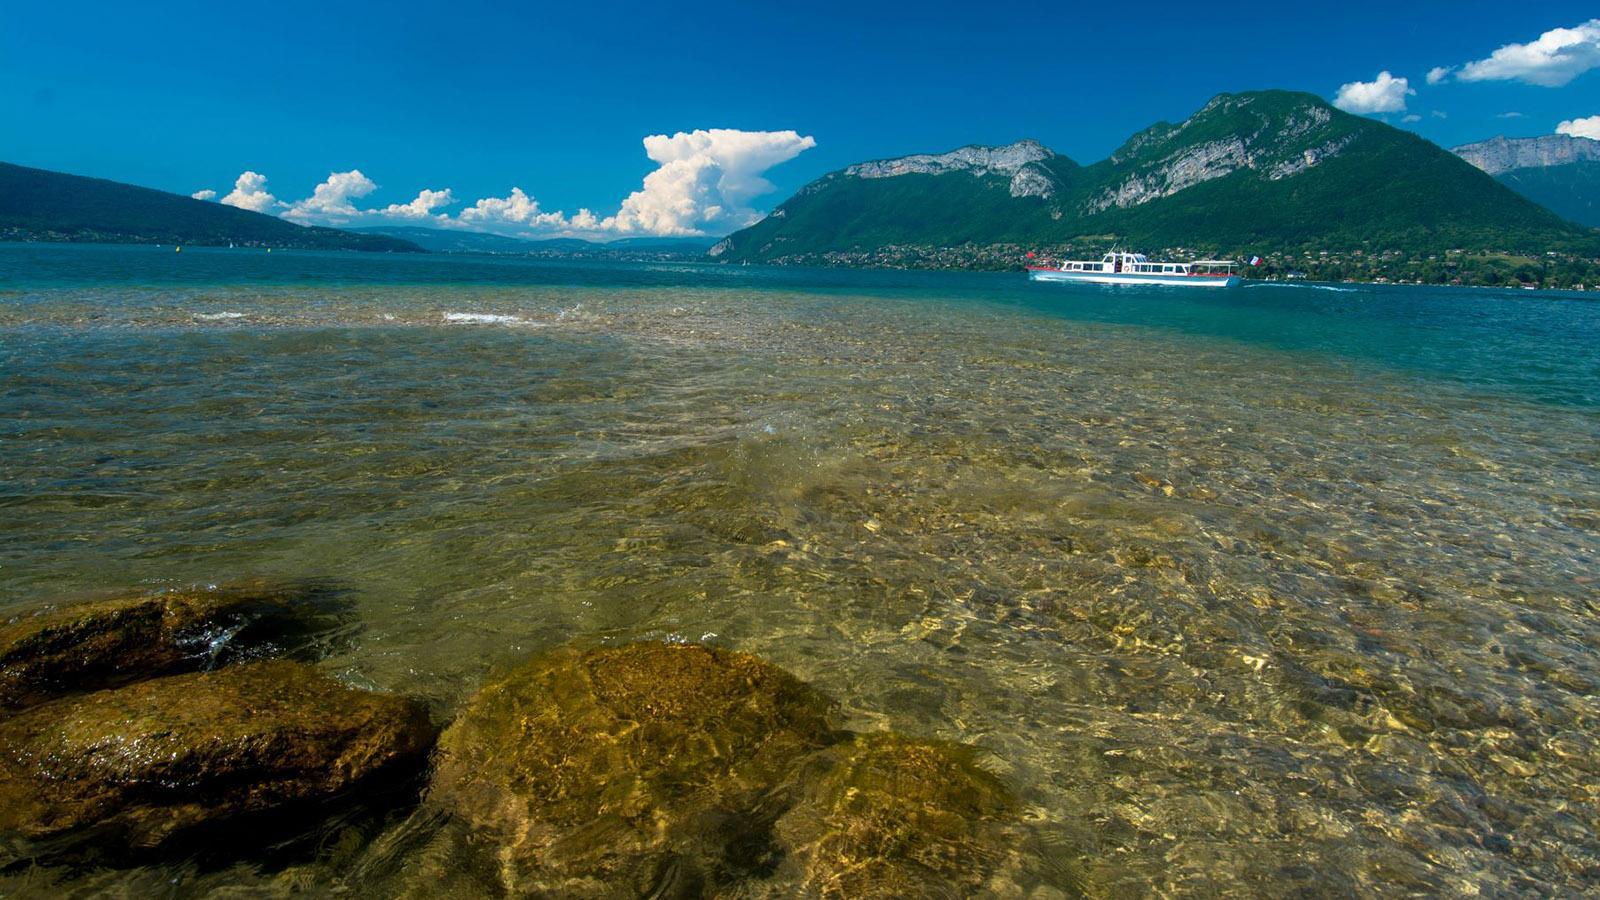 Lac d'annecy_credits_Tanja Midgardson